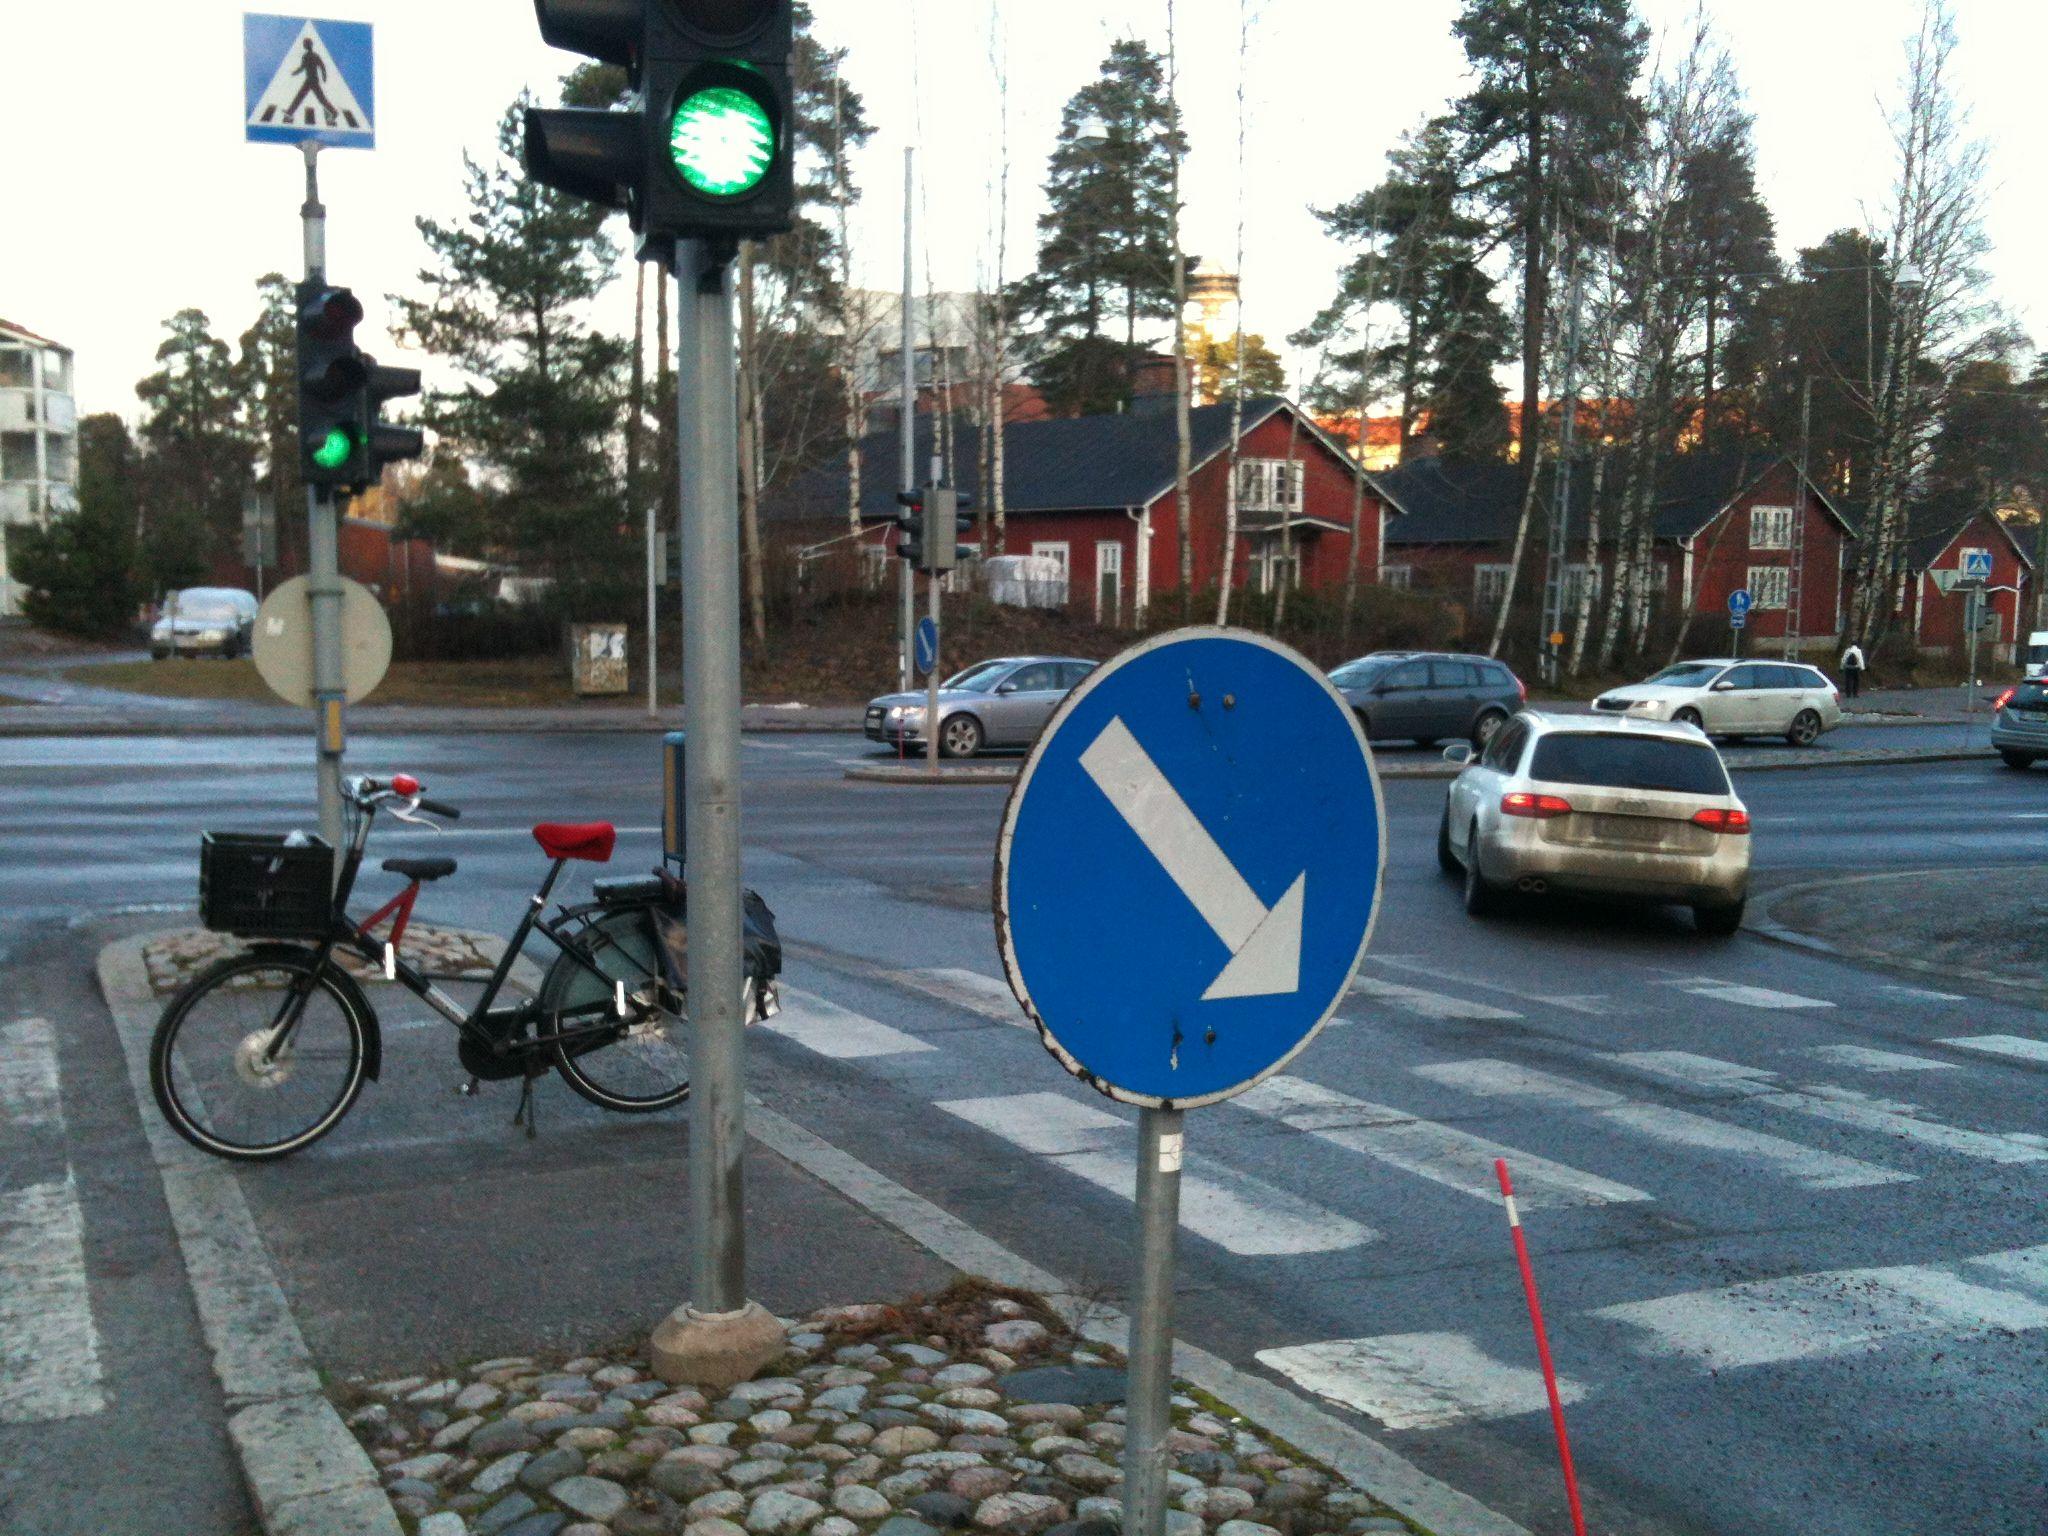 Fr8 at the traffic lights